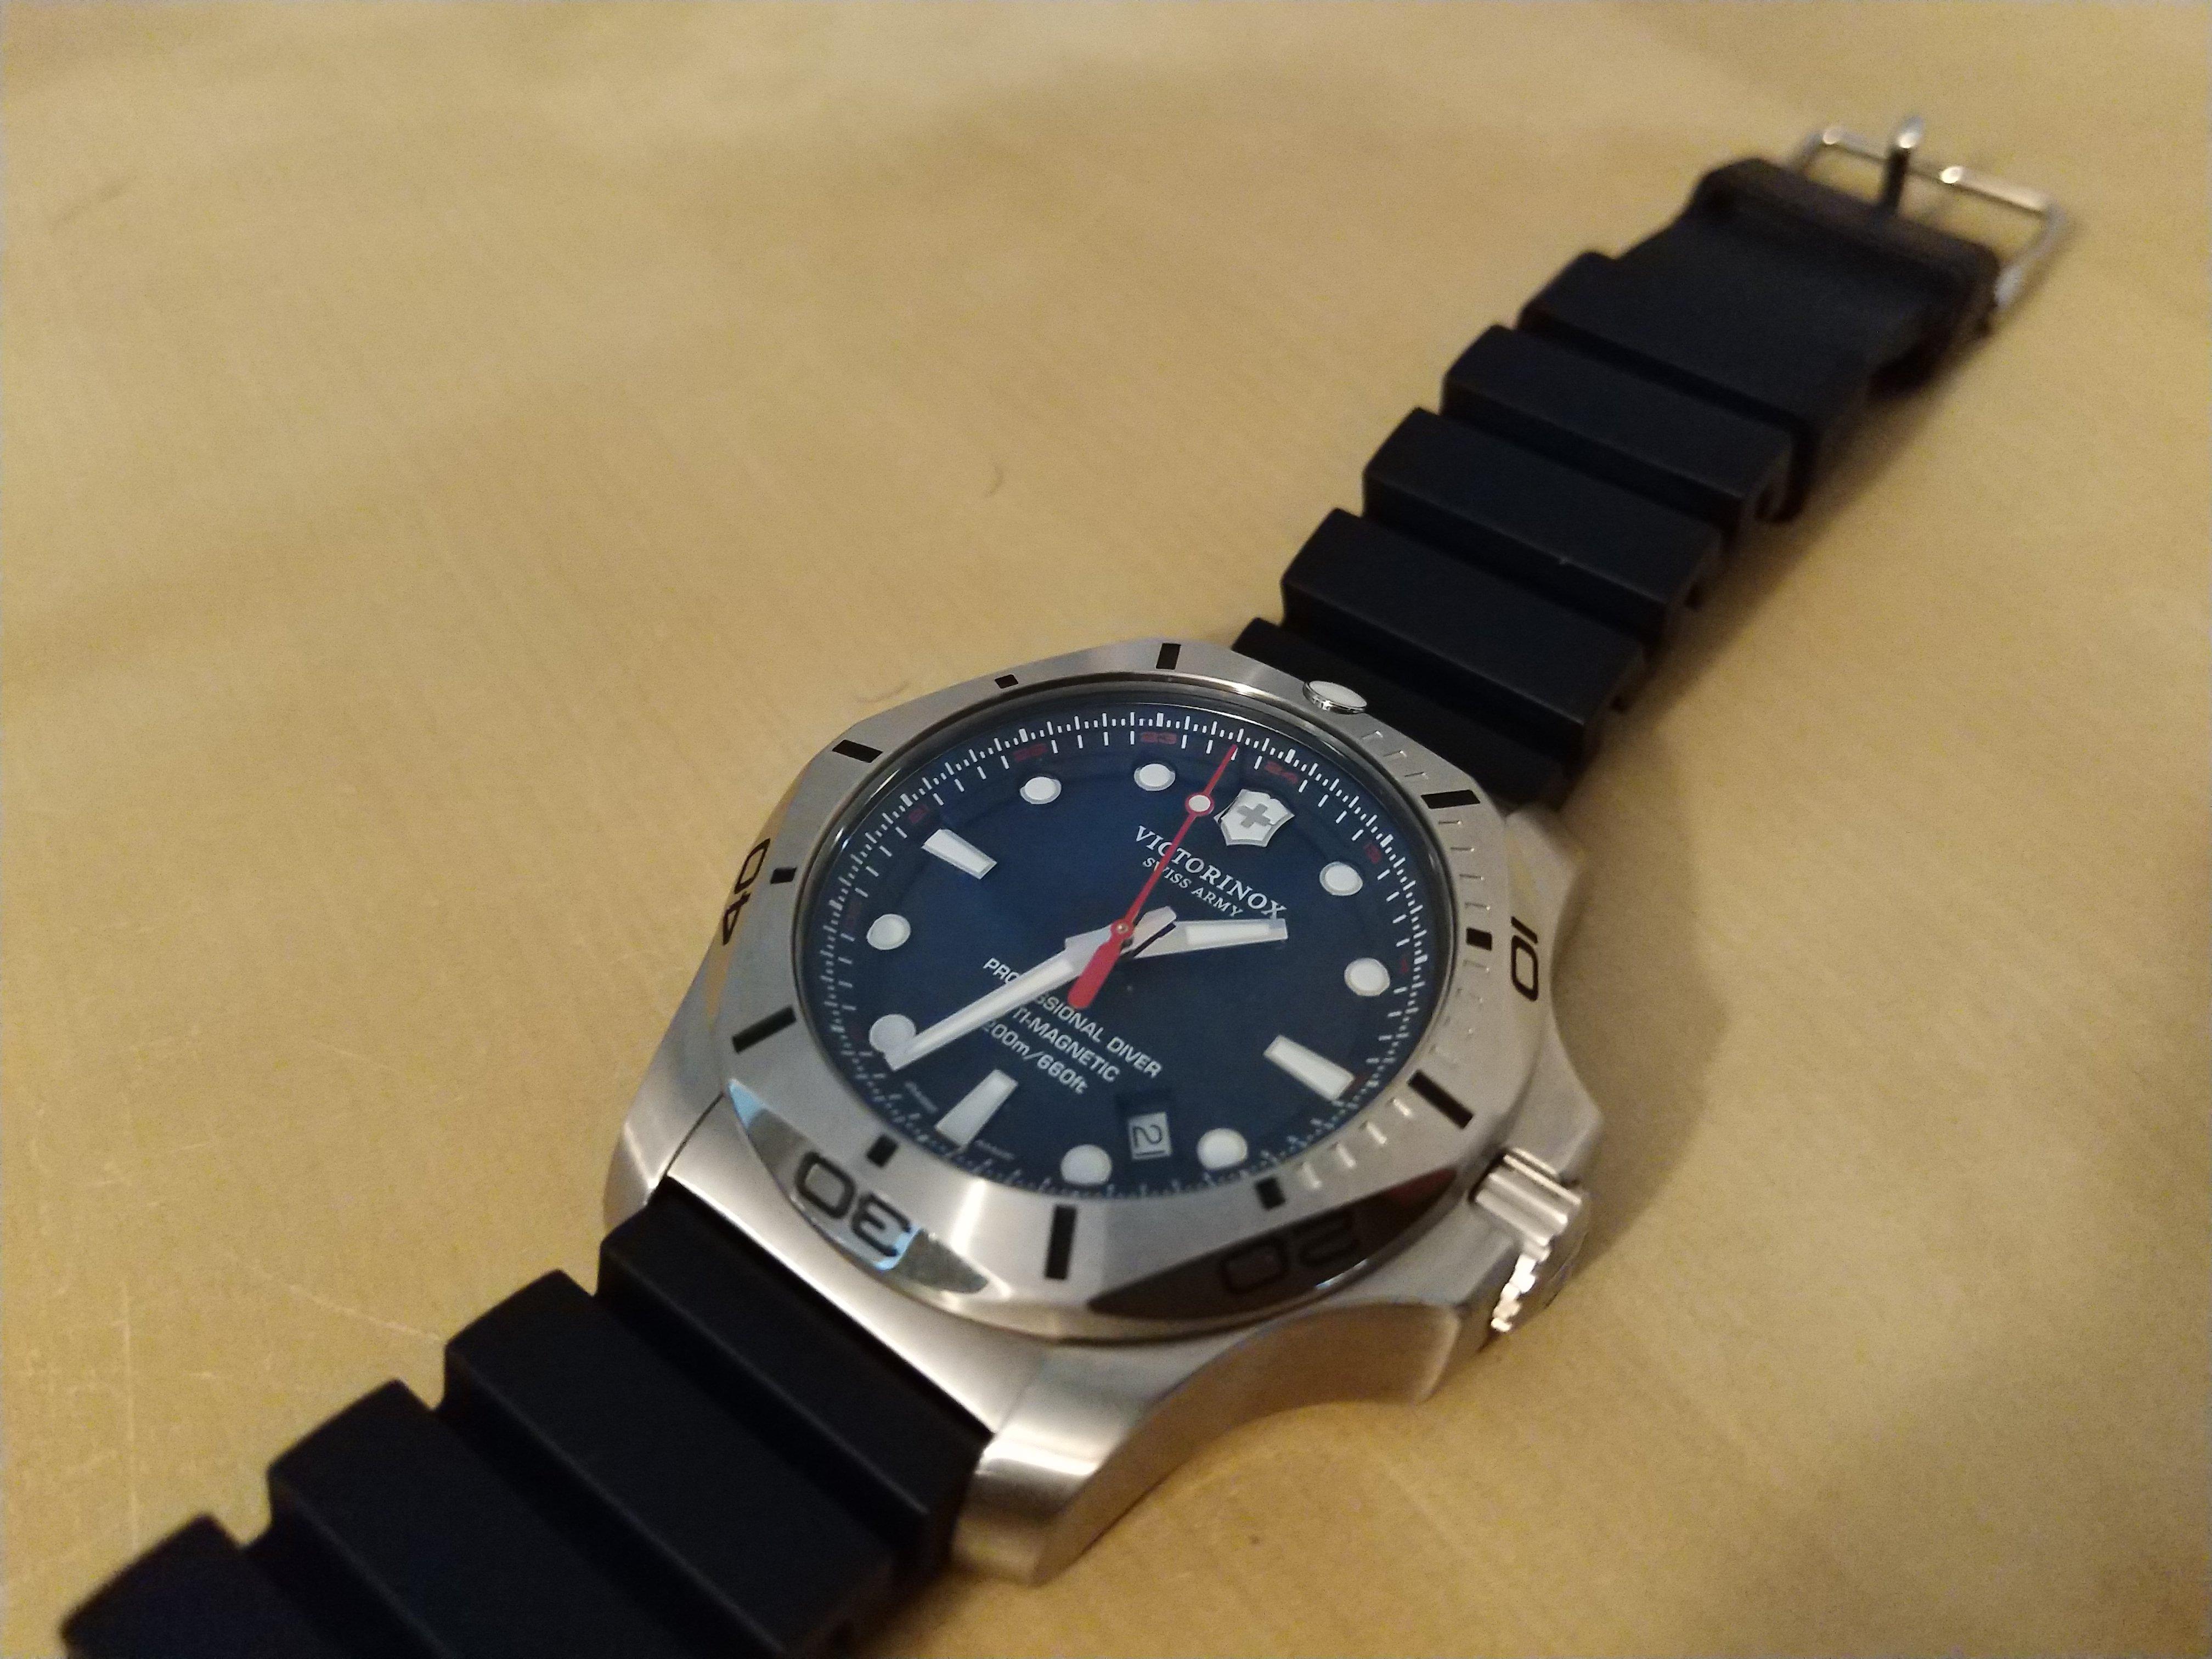 Victorinox Inox Pro Diver Review A Distinctive Diving